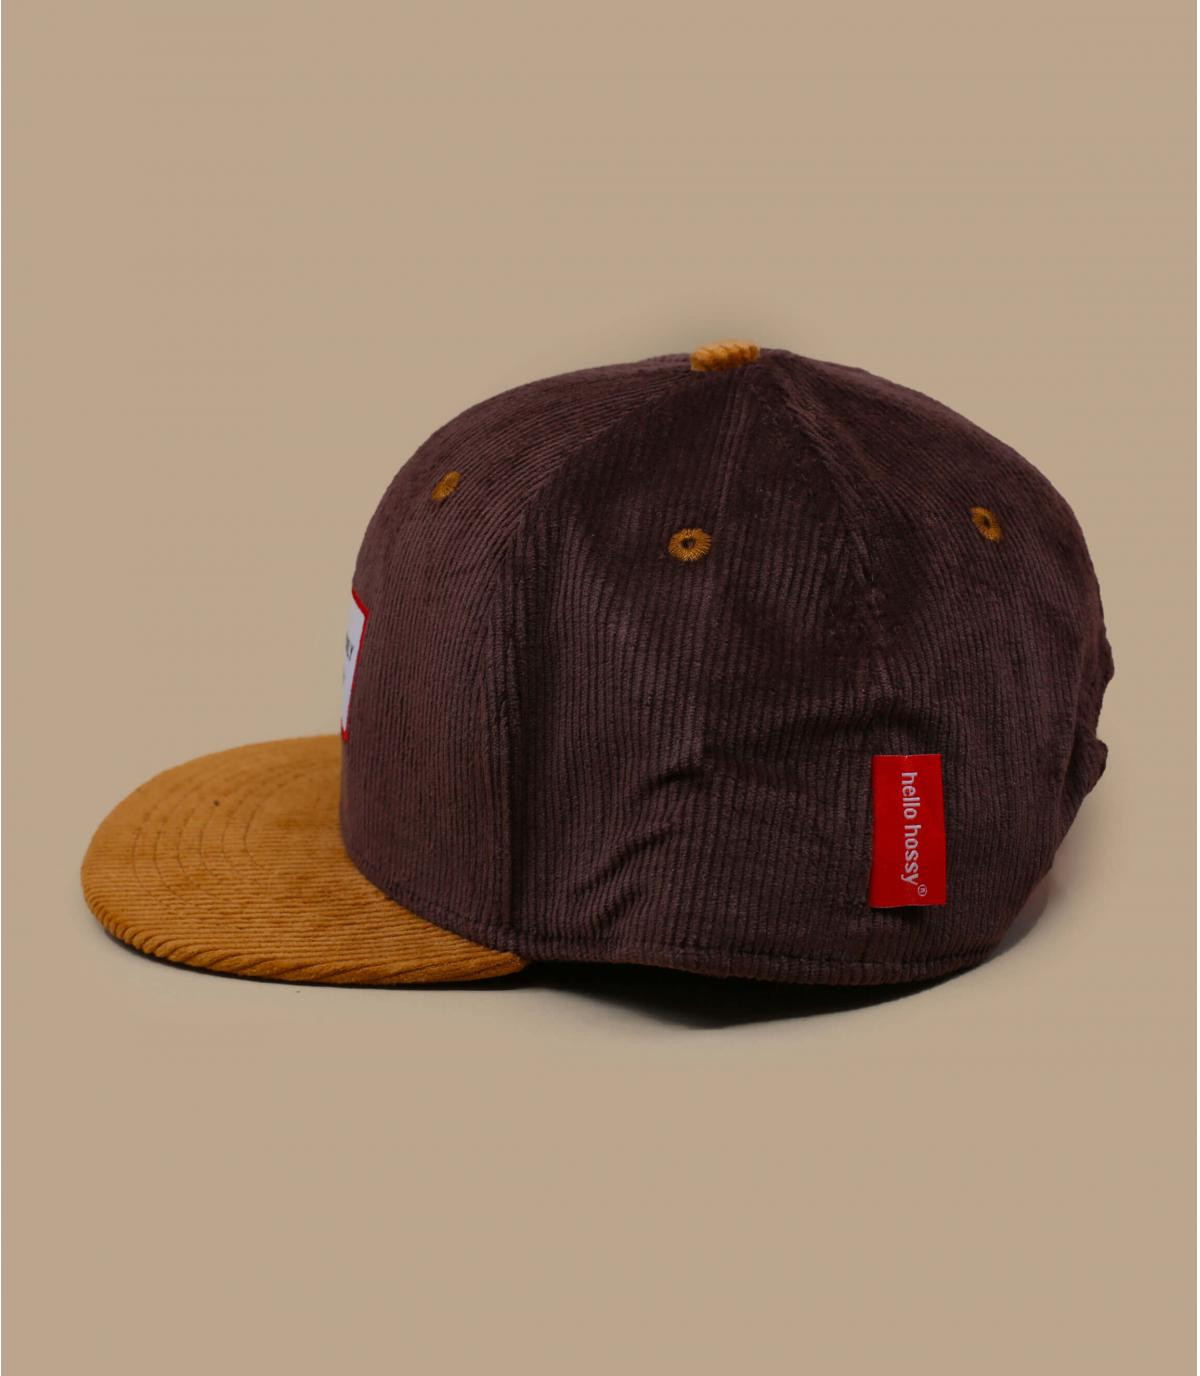 Brown corduroy child cap